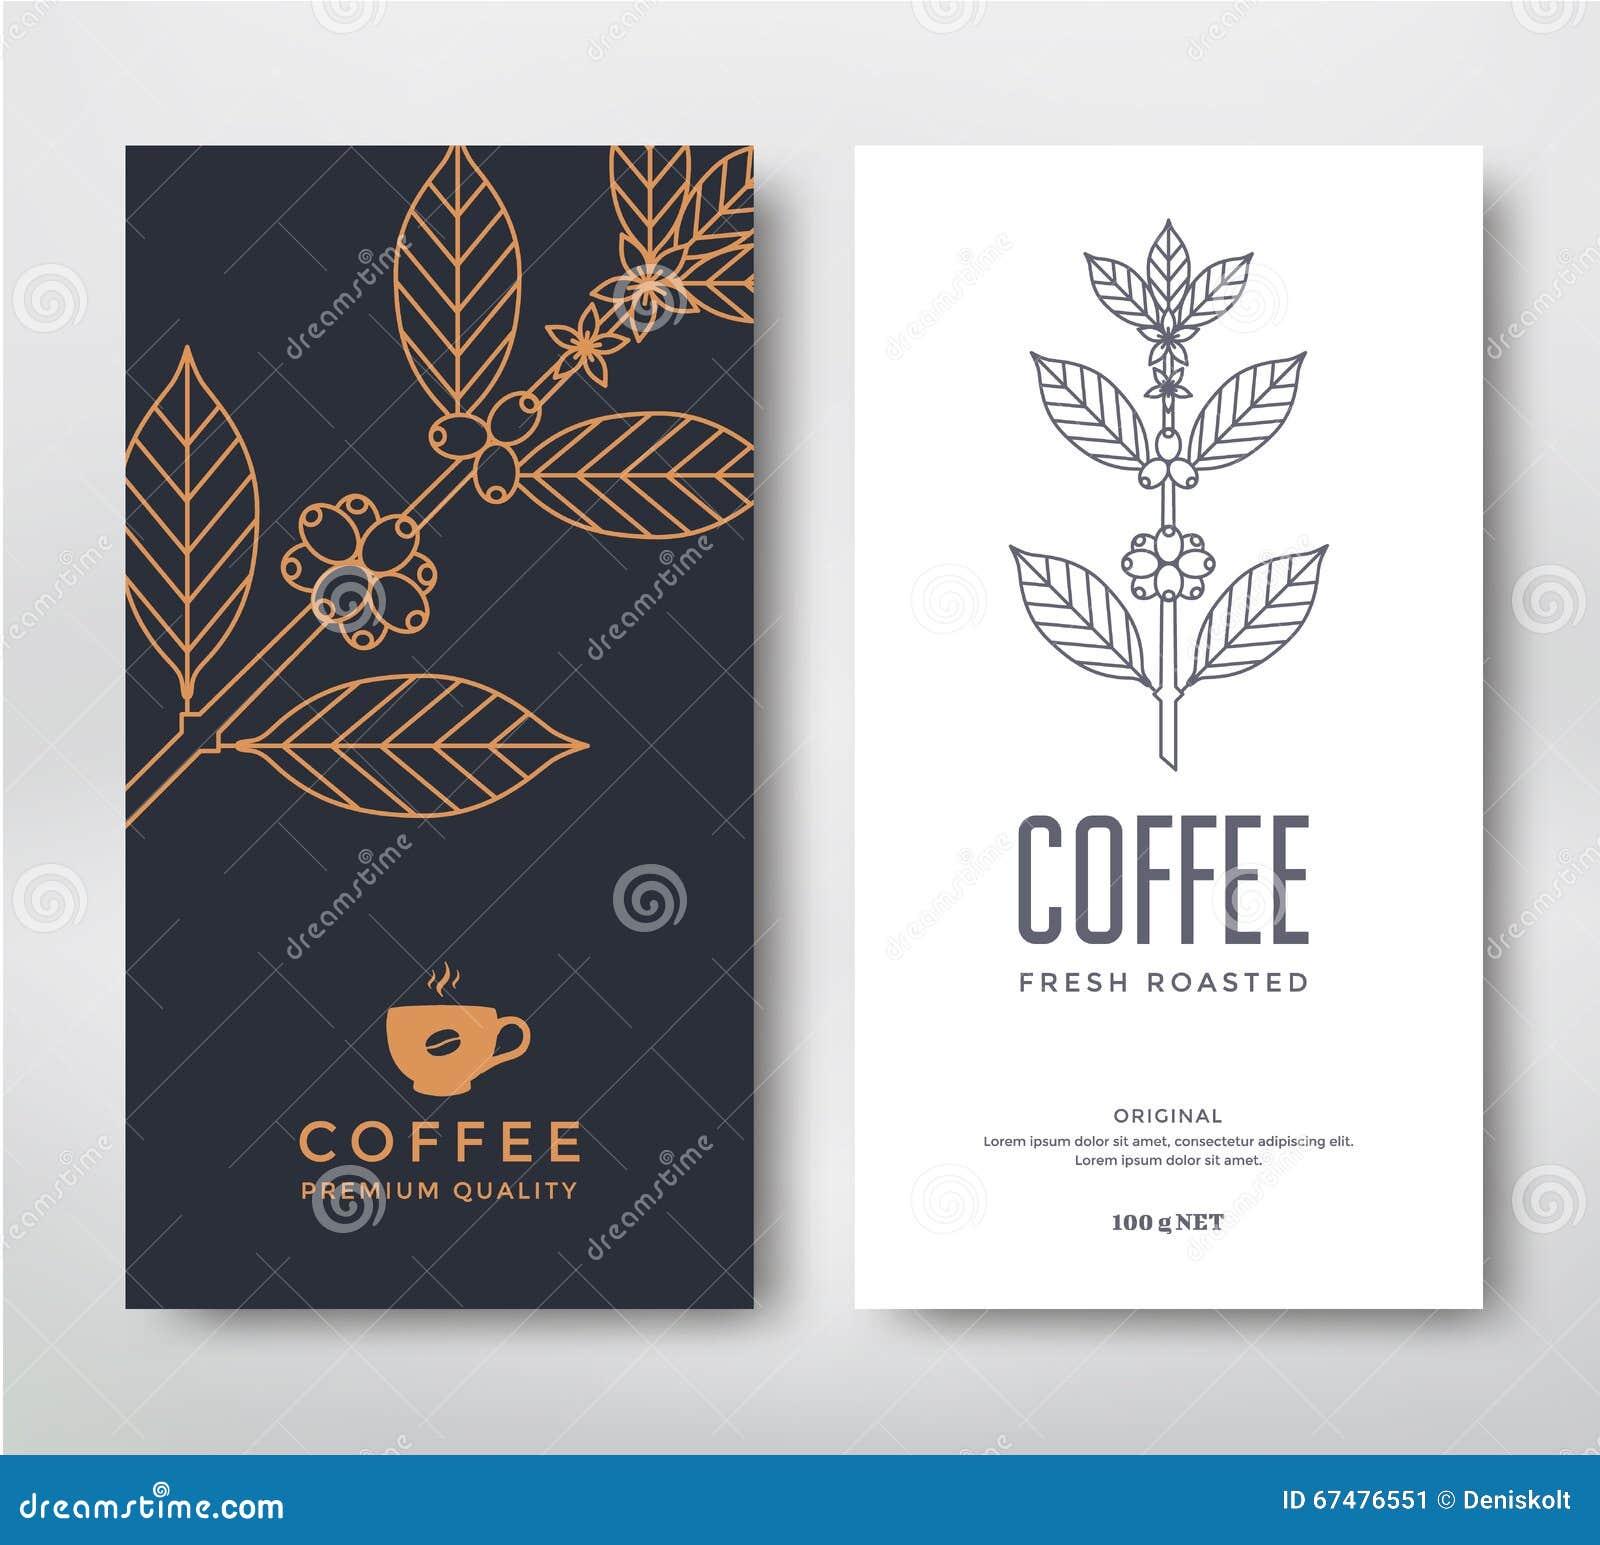 Coffee Packaging Designs coffee packaging design stock vector - image: 68767947